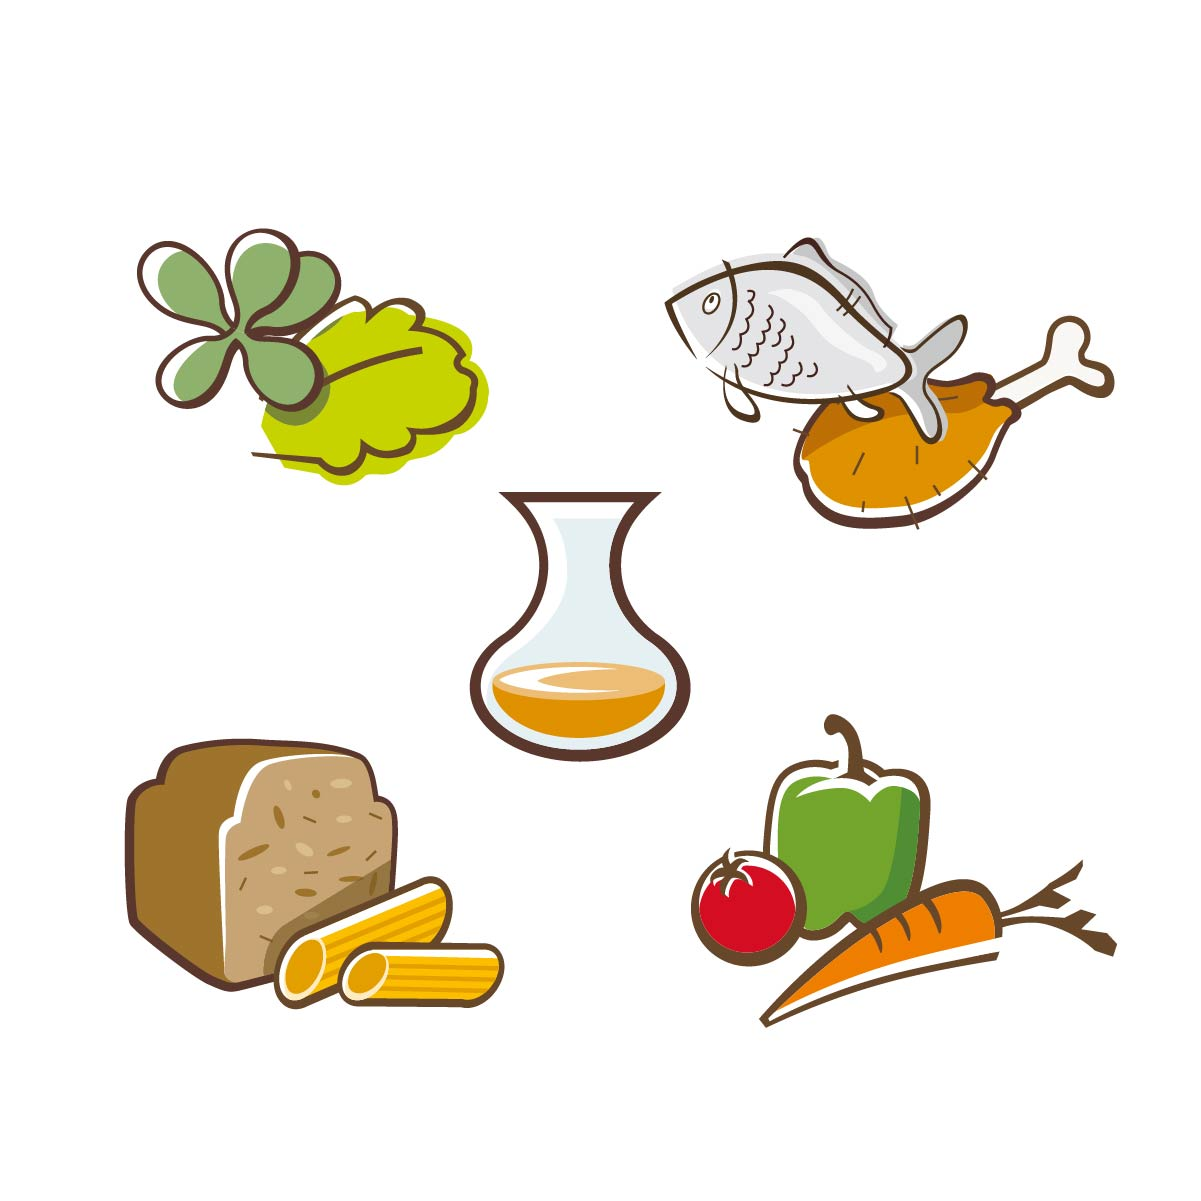 Symbole Icons Vectorstyle Salat Fisch Brot Gemüse Nudeln Saft Speisekarte